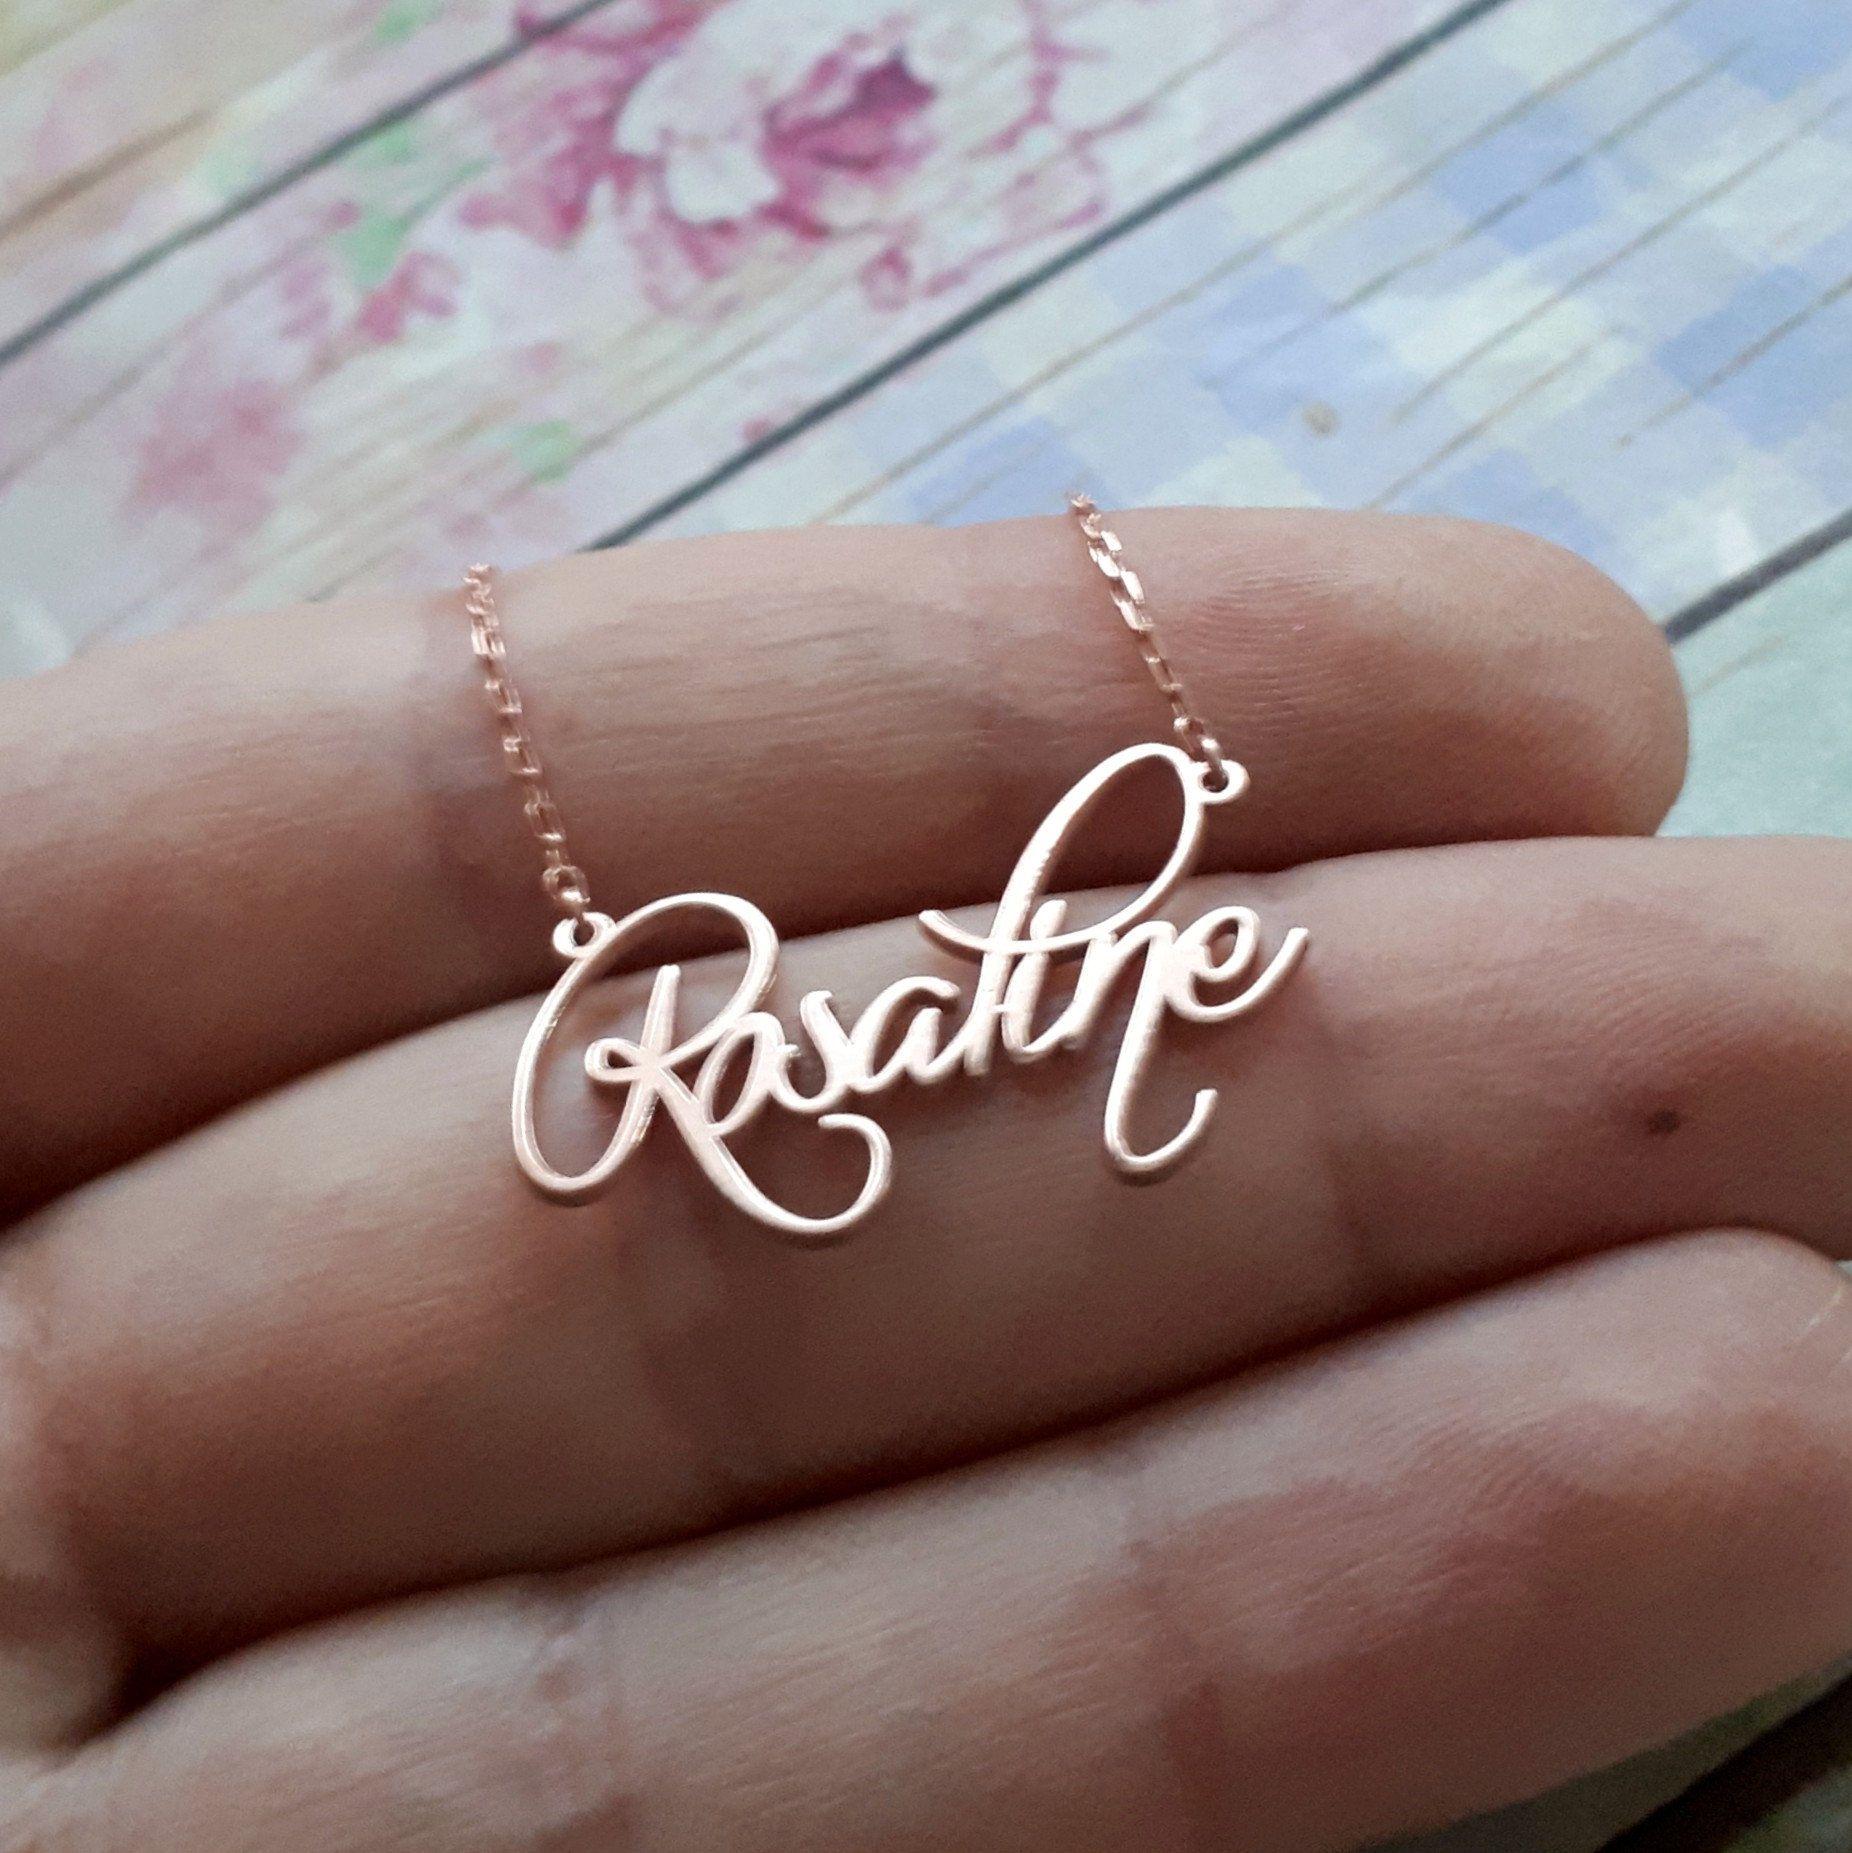 14k Solid Gold Name Necklace Rose Gold Name Necklace Gold Personalized Necklace Custo Gold Name Necklace Sterling Necklaces Personalized Gold Necklace